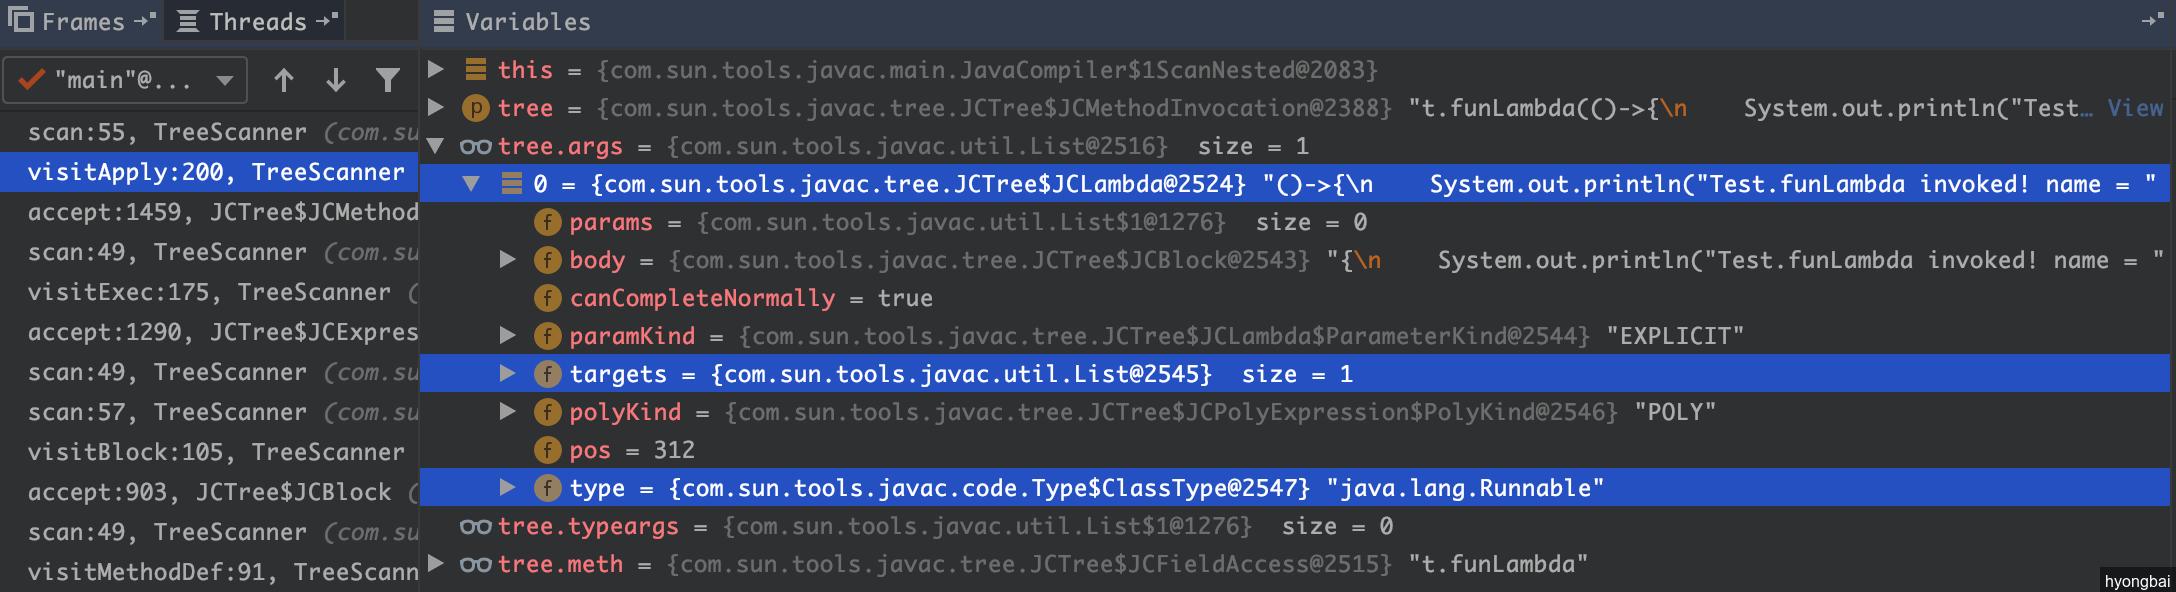 java-javac-compile2-desugar-TreeScanner-visitApply-JCMethodInvocation-args-JCLambda-Test.png